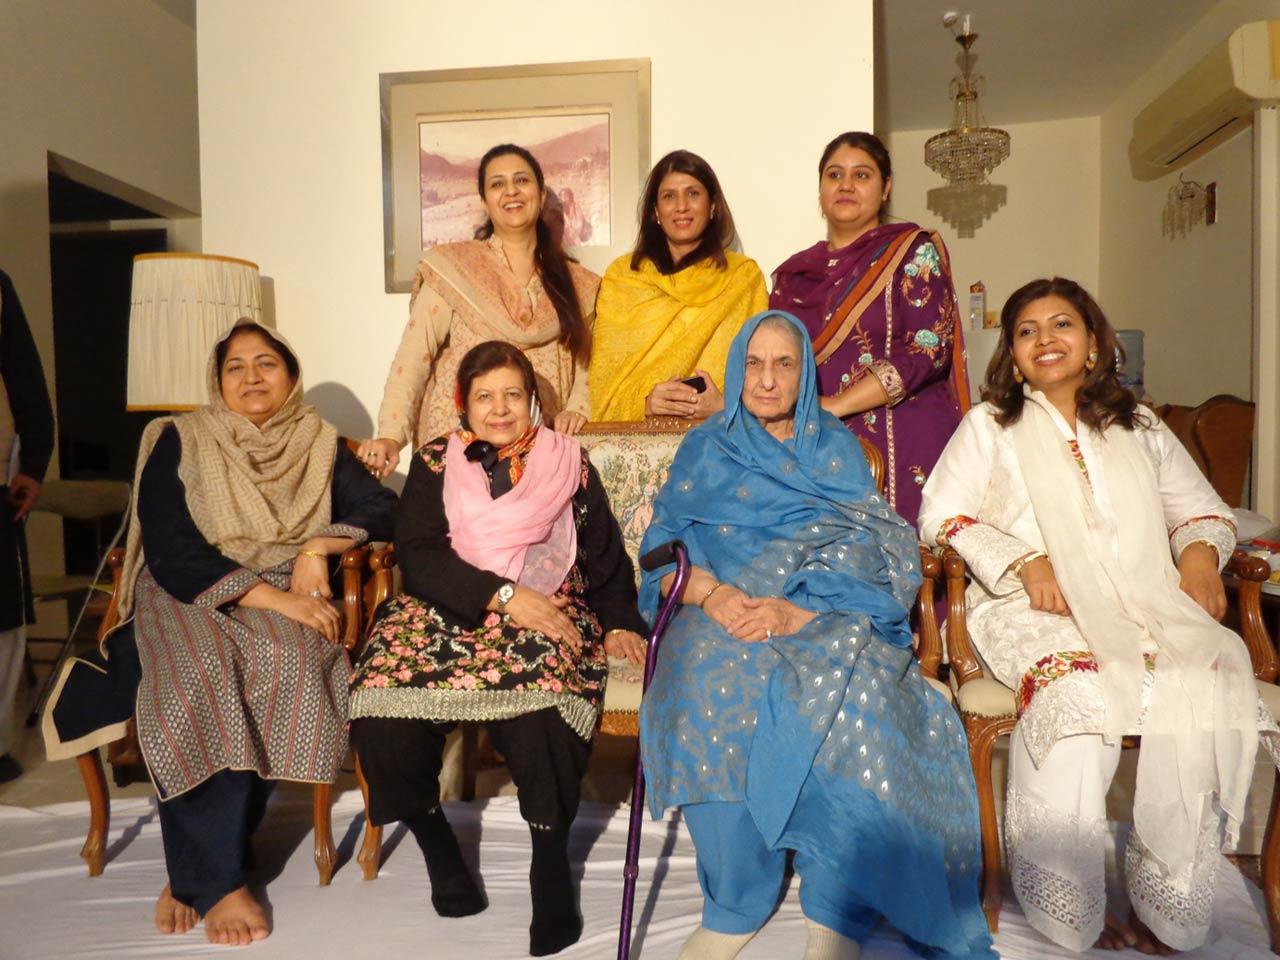 Front: Samina Jawad, Mrs. Mah Noor Siddiqi, Mrs. Zahida Mehmool Ali, Rajia Mushtaq - Back Row: Mrs. Abid Hasan, Mrs. Khalid Hasan, Aiysha Abrar